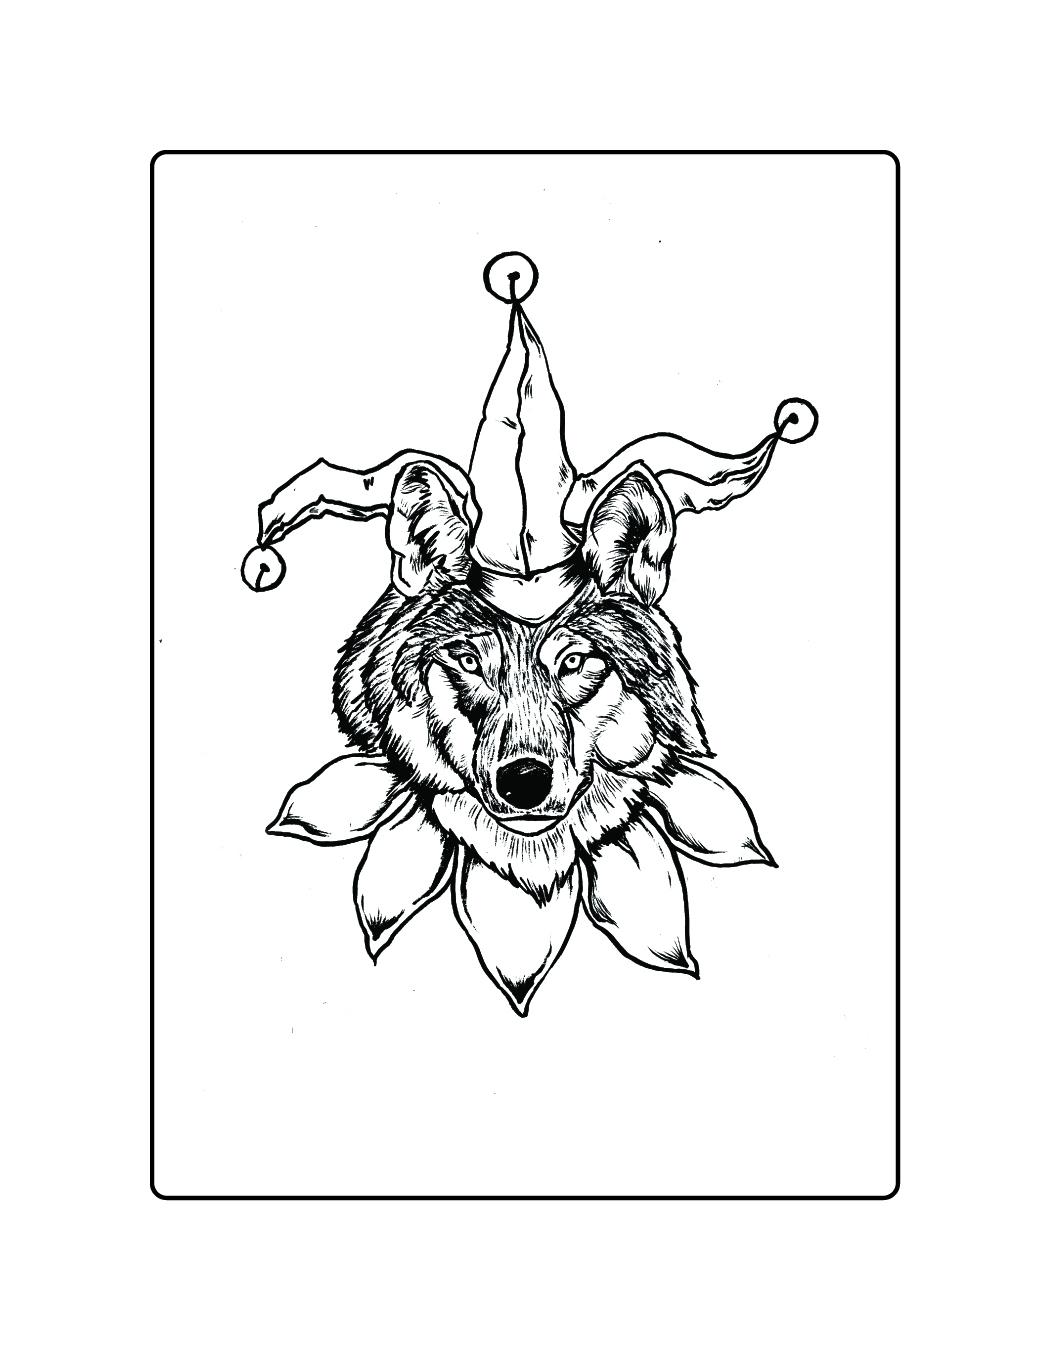 card_draft_1-58.jpg